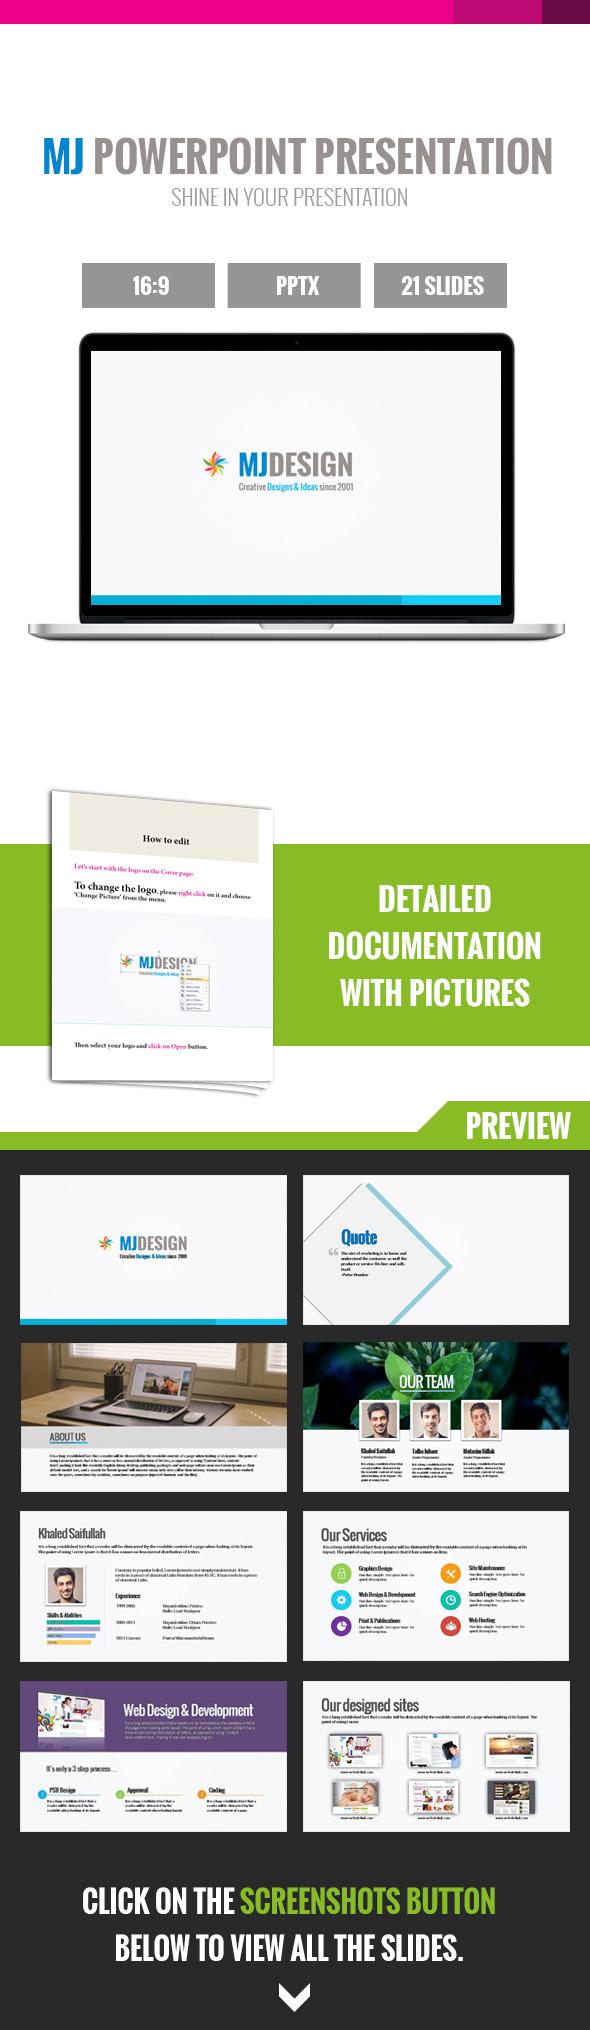 GraphicRiver MJ Creative Powerpoint Presentation 8825744